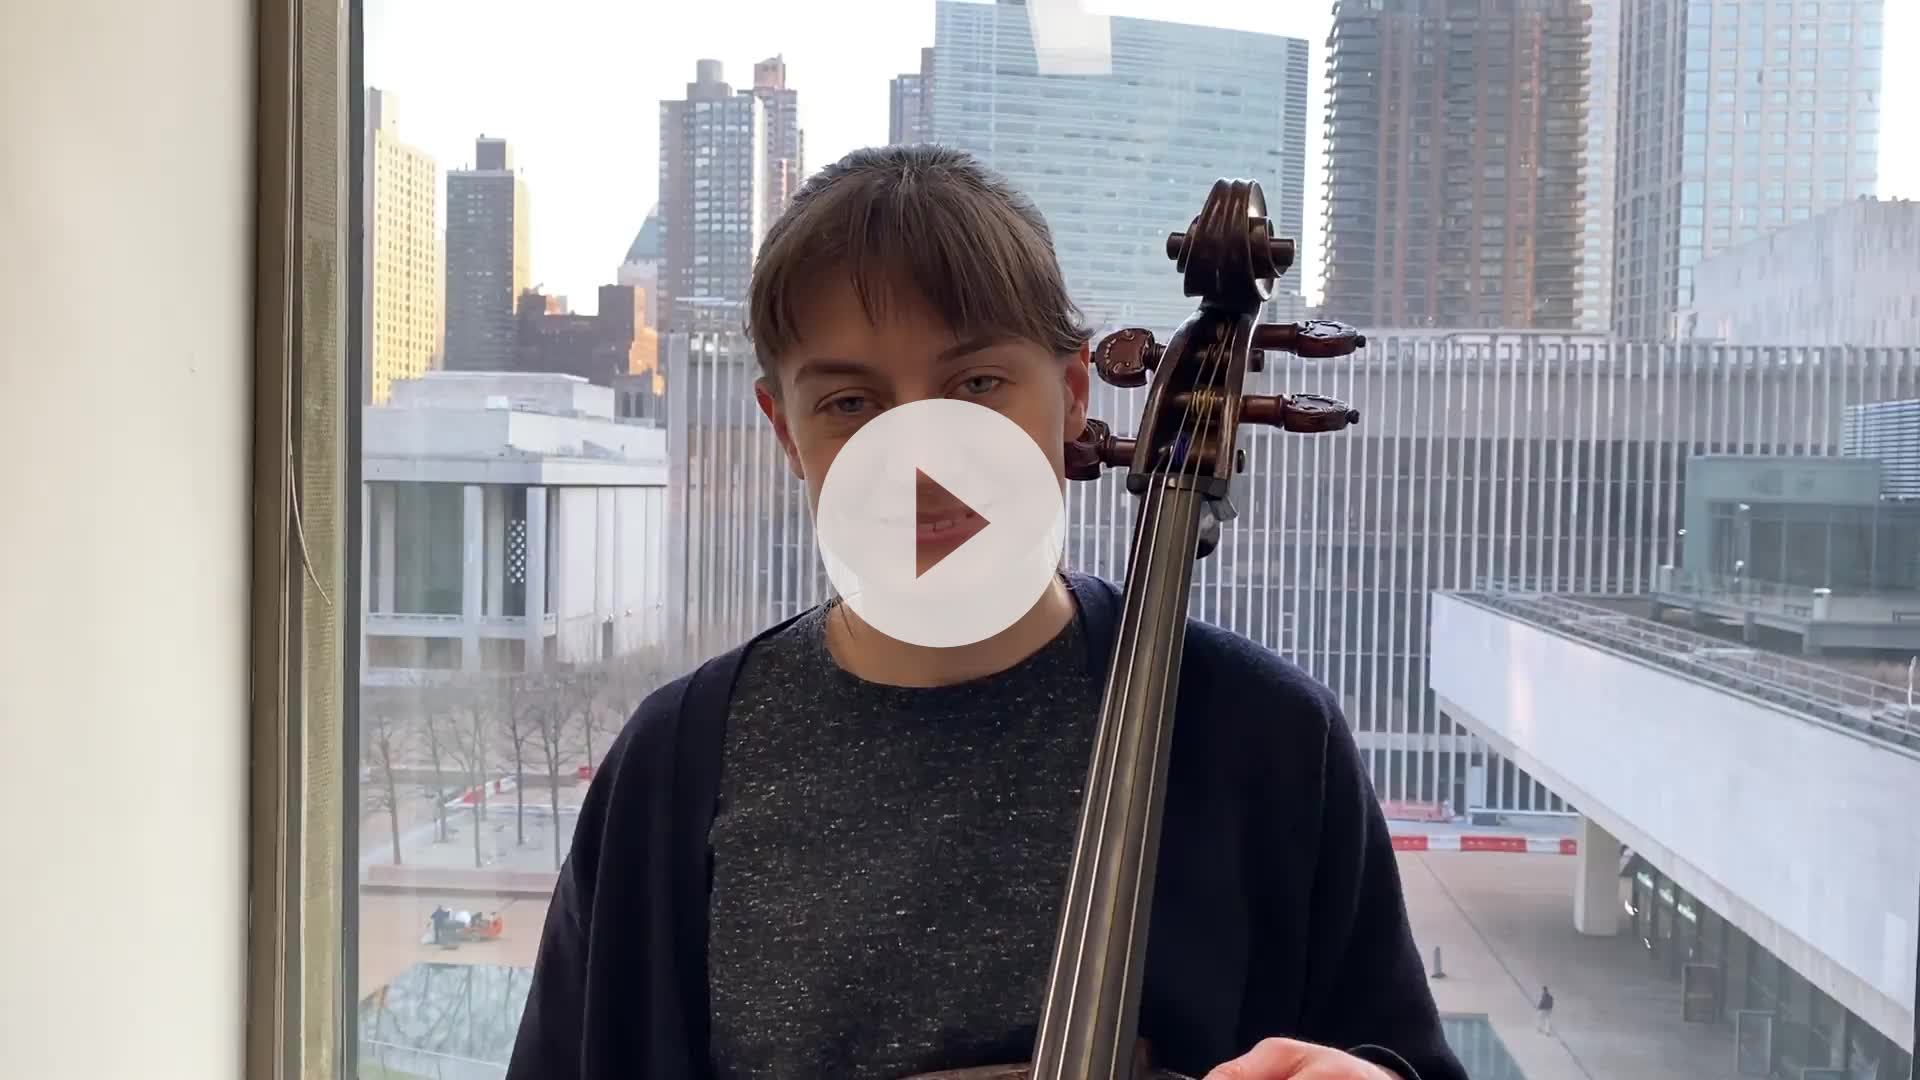 Watch the The Juilliard School video